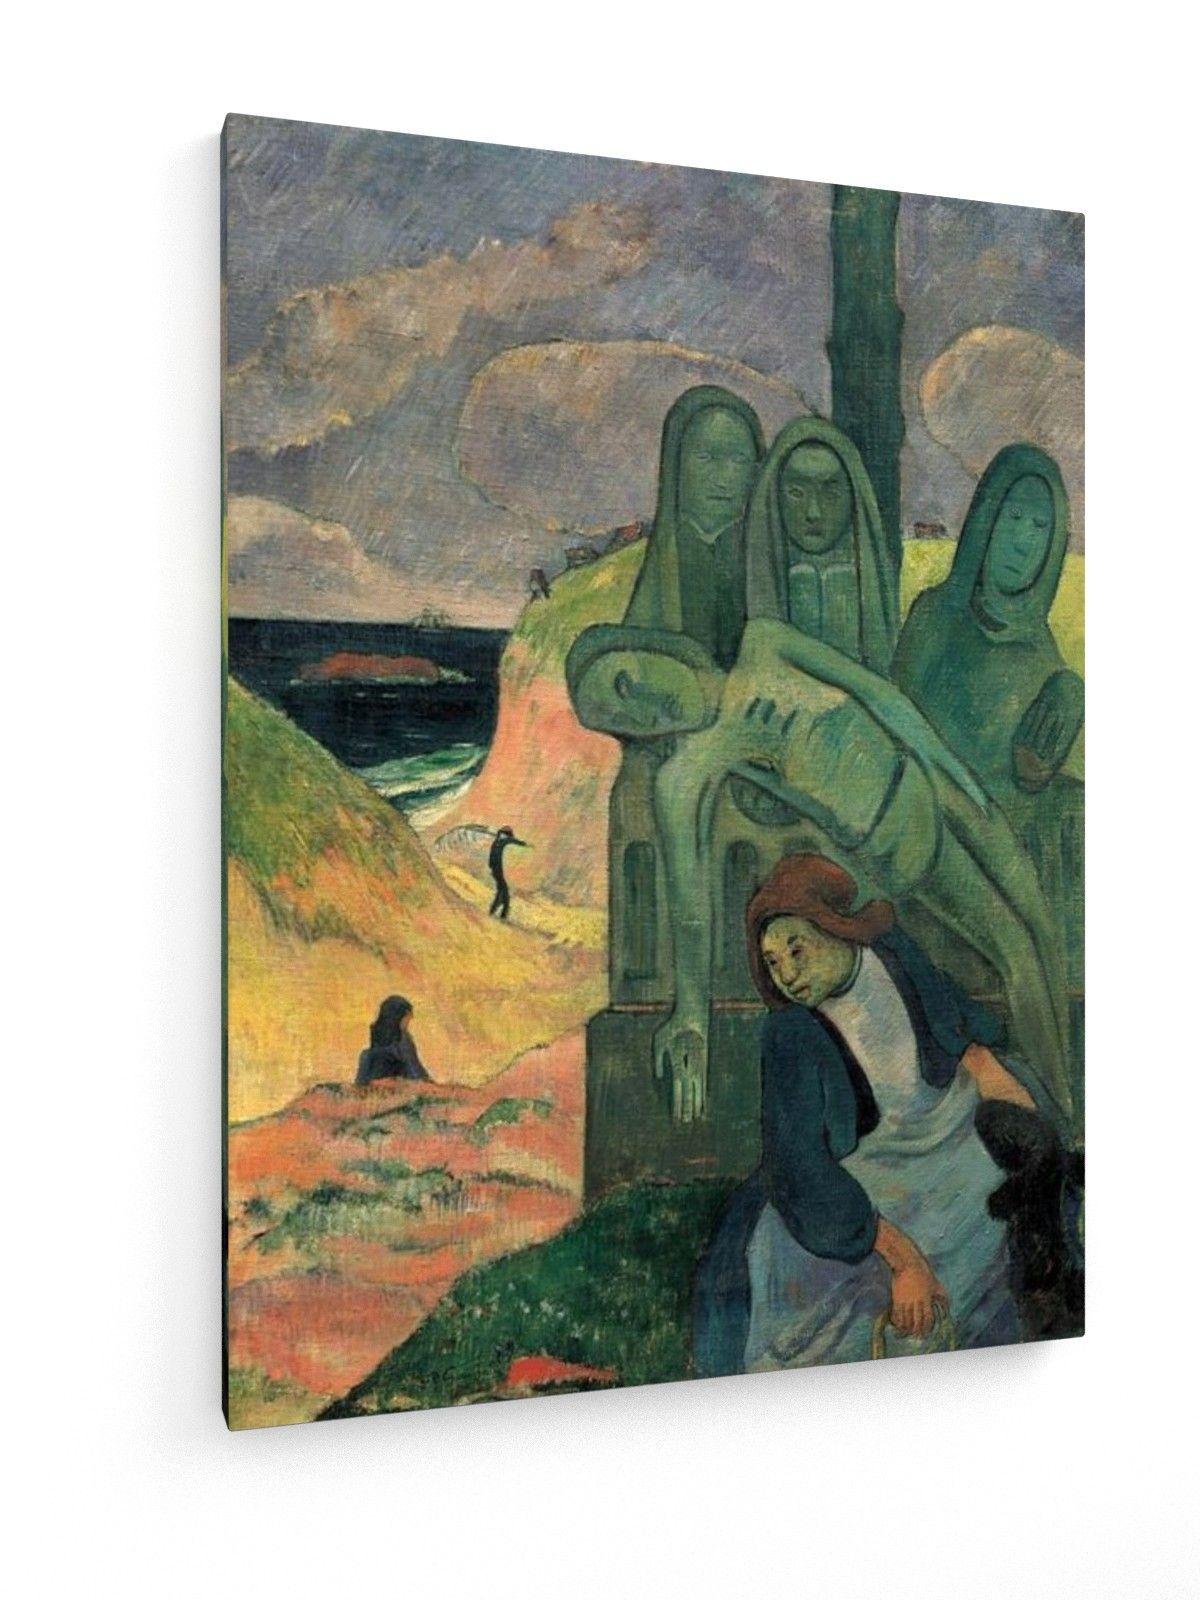 Paul Gauguin - Cristo verde #Paul #Gauguin #weewado #religion #beach #(ocean) #sea #crucifixion